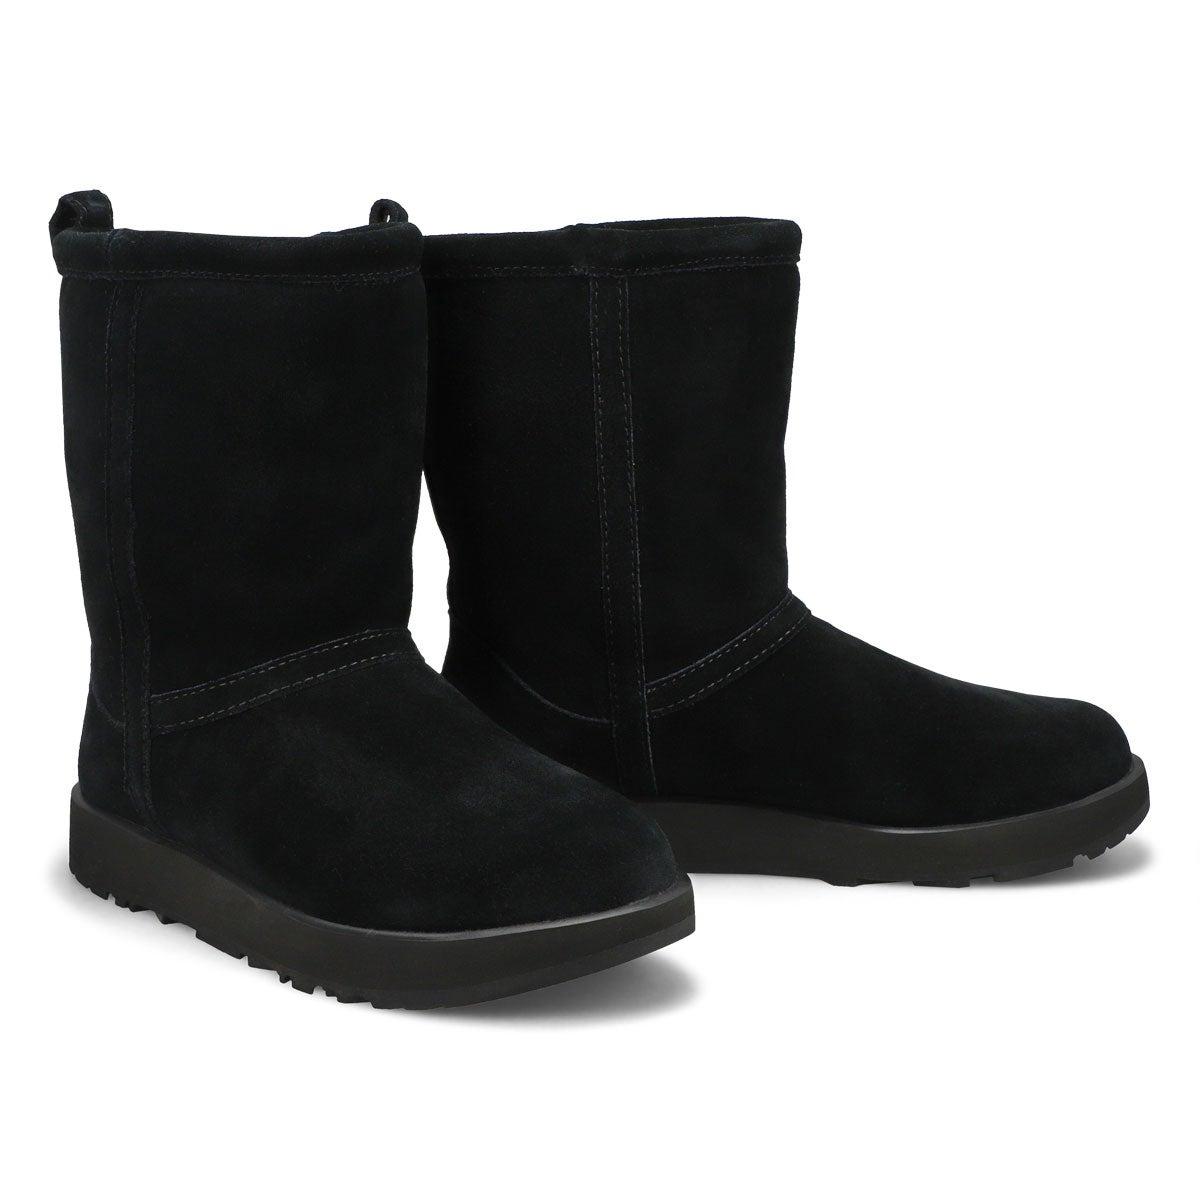 Women's Classic Short Waterproof Boot - Black